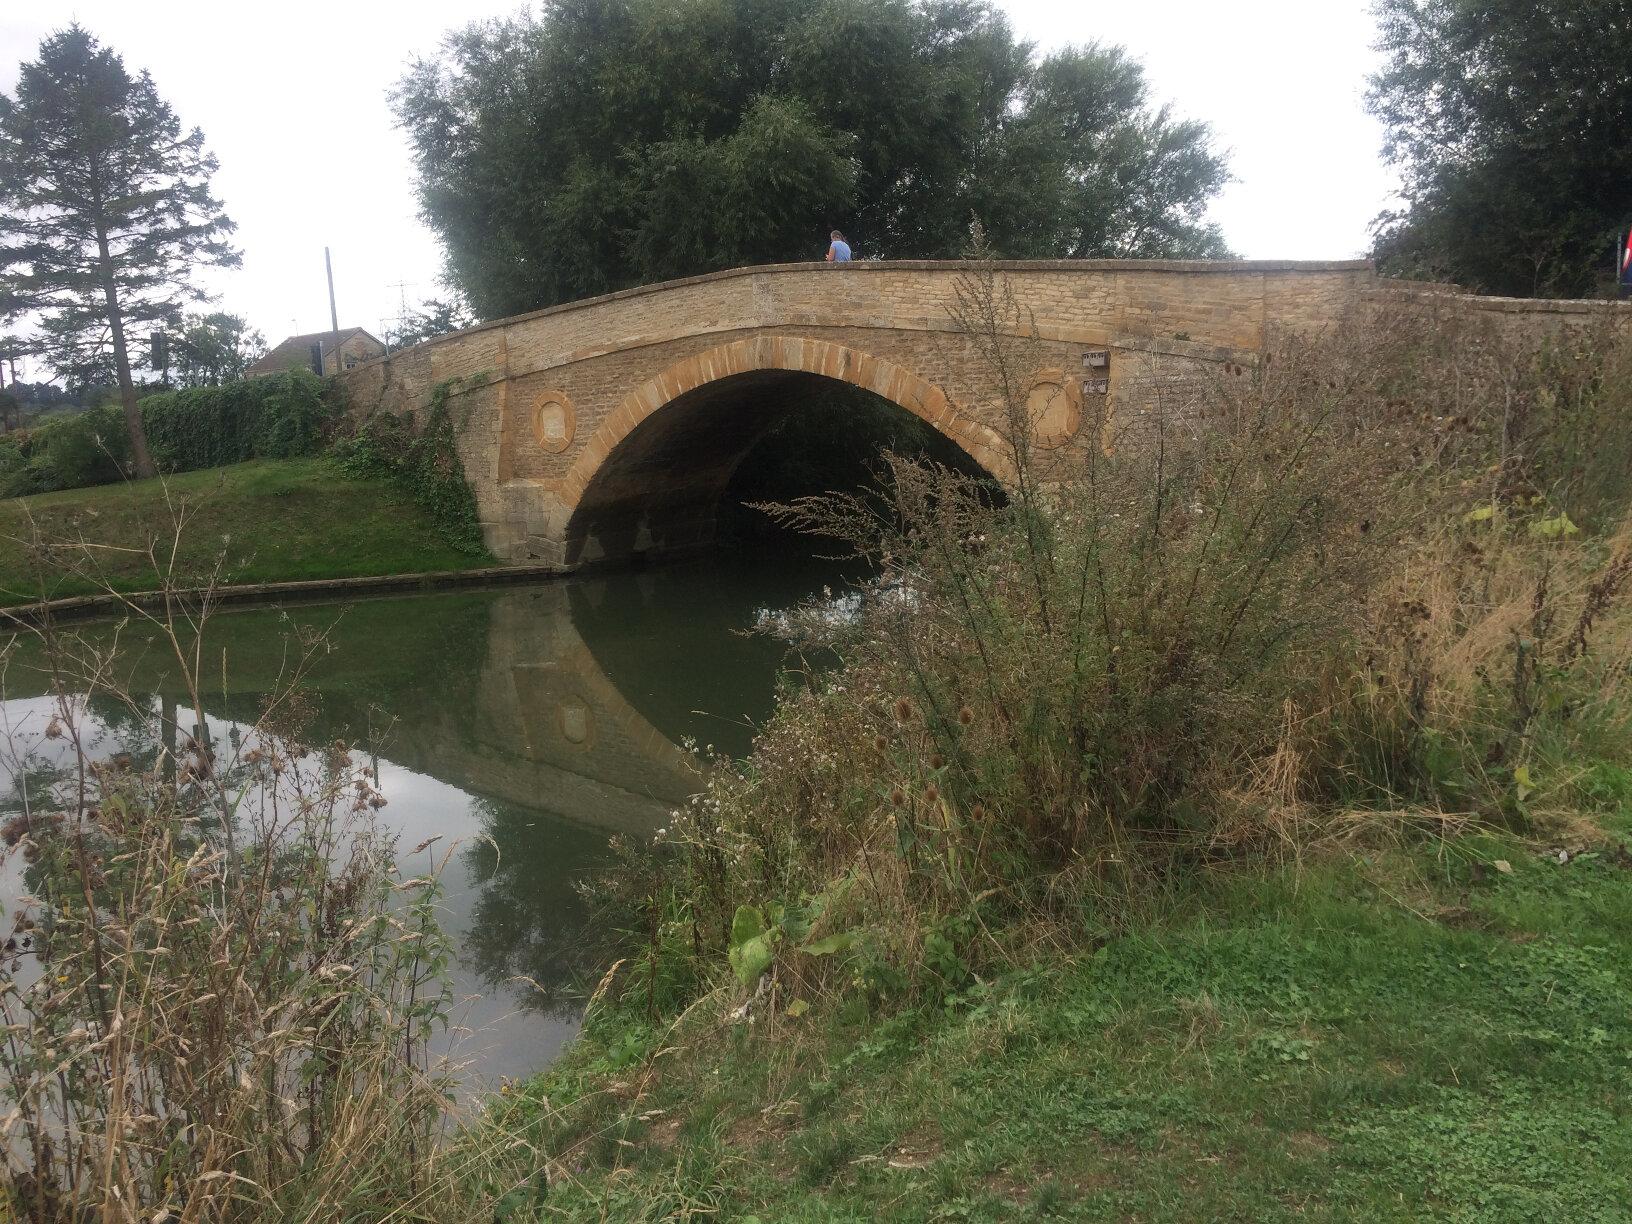 From Lechlade to Newbridge